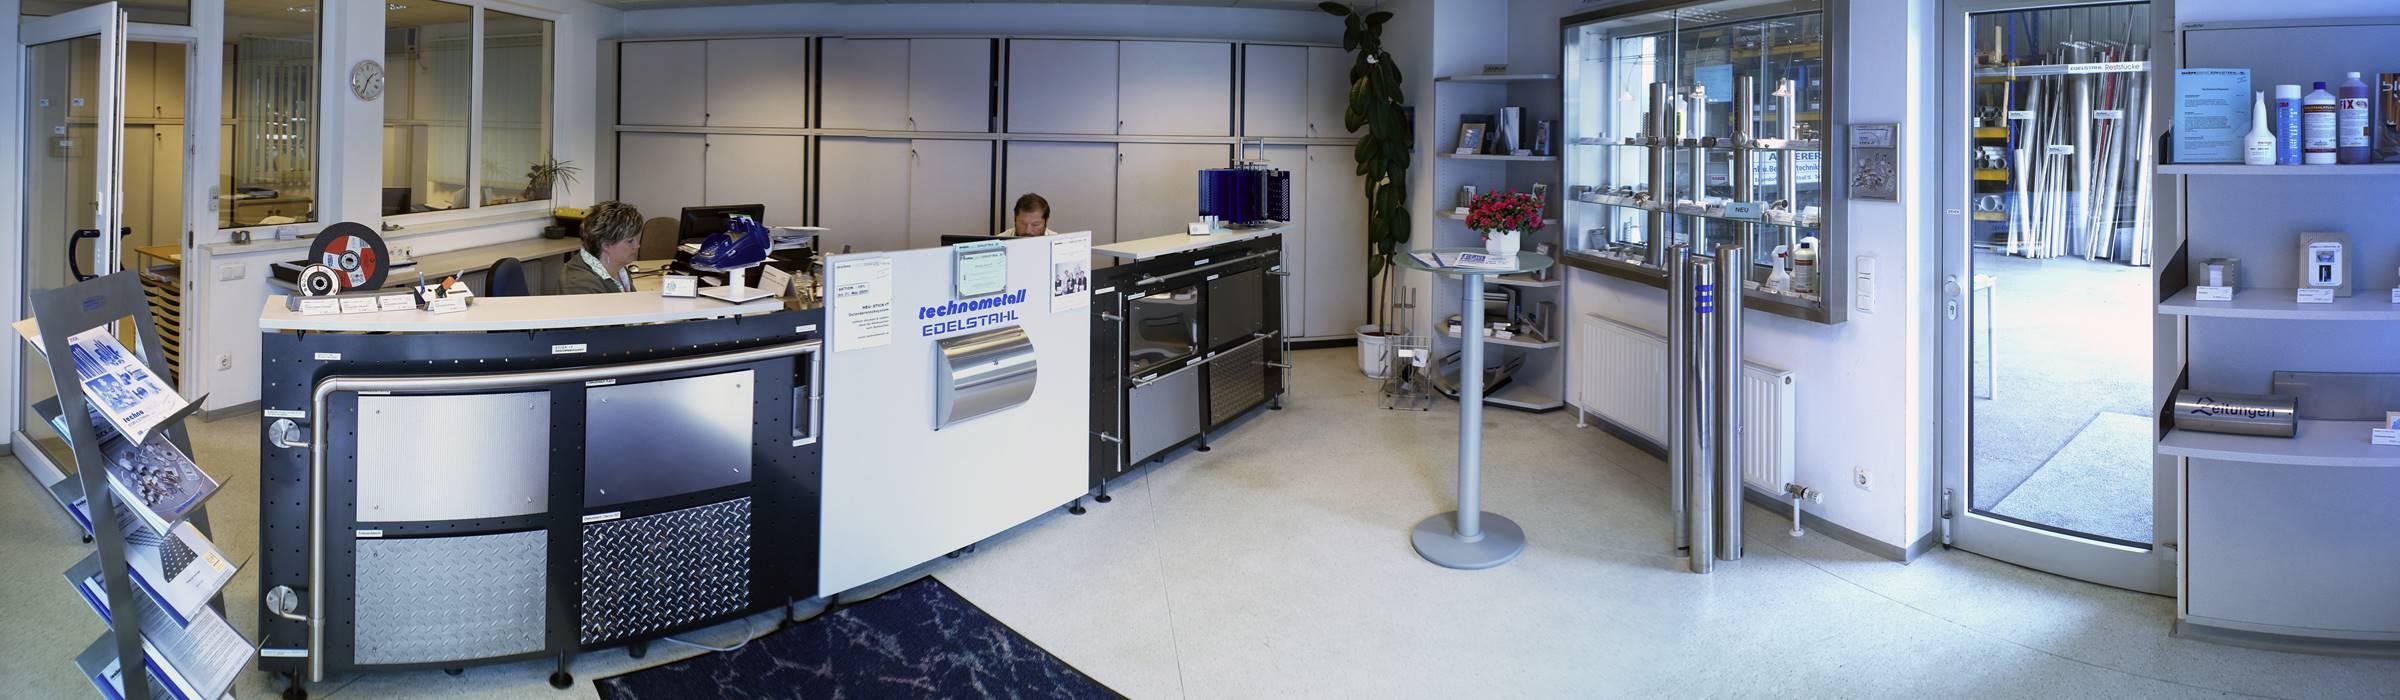 technometall Edelstahl in Wels, Oberösterreich